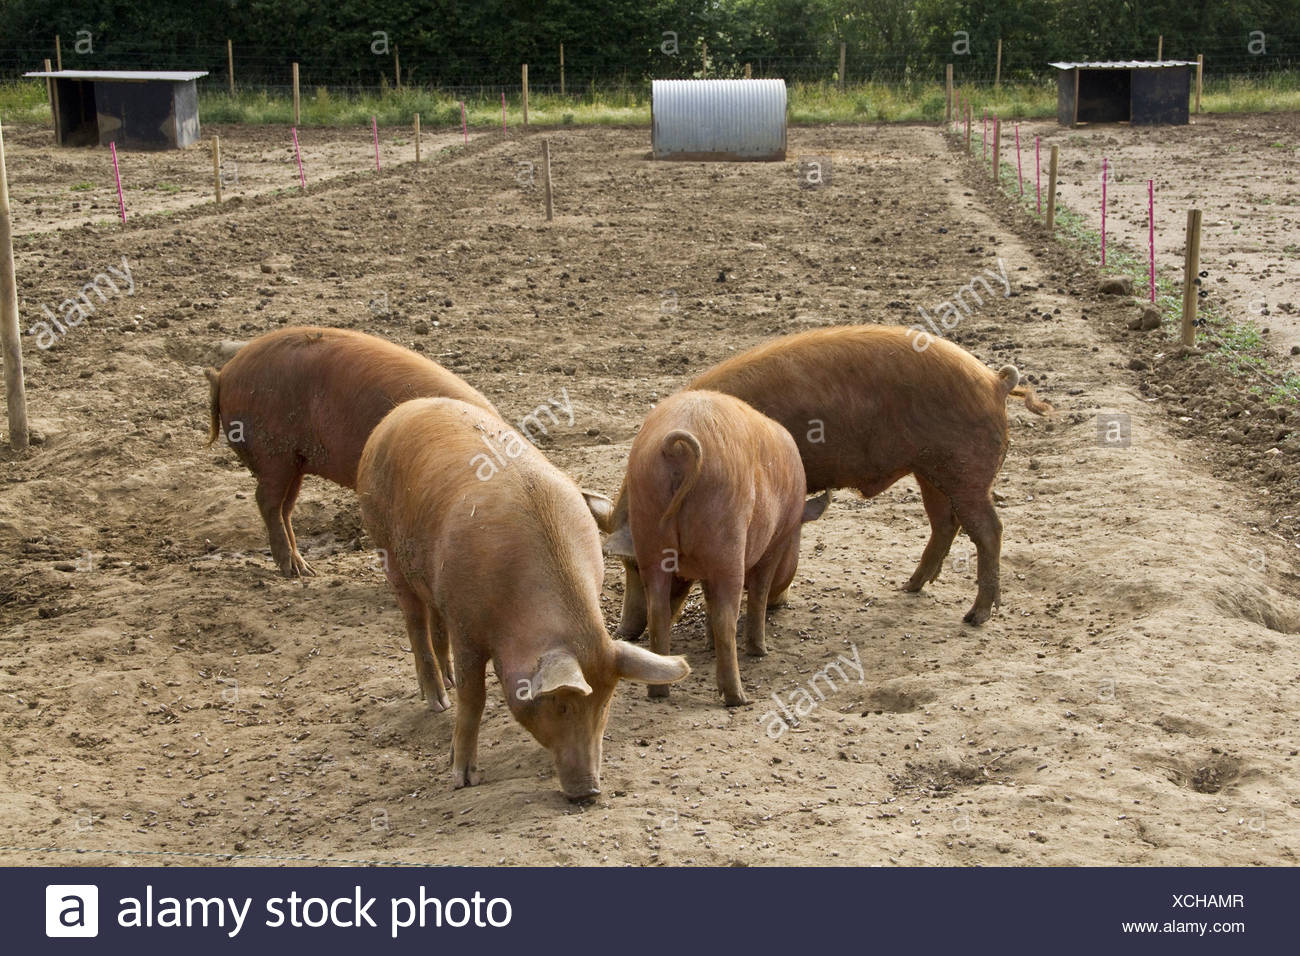 Tamworth Pigs Feeding On Pignuts Stock Photo 283123367 Alamy